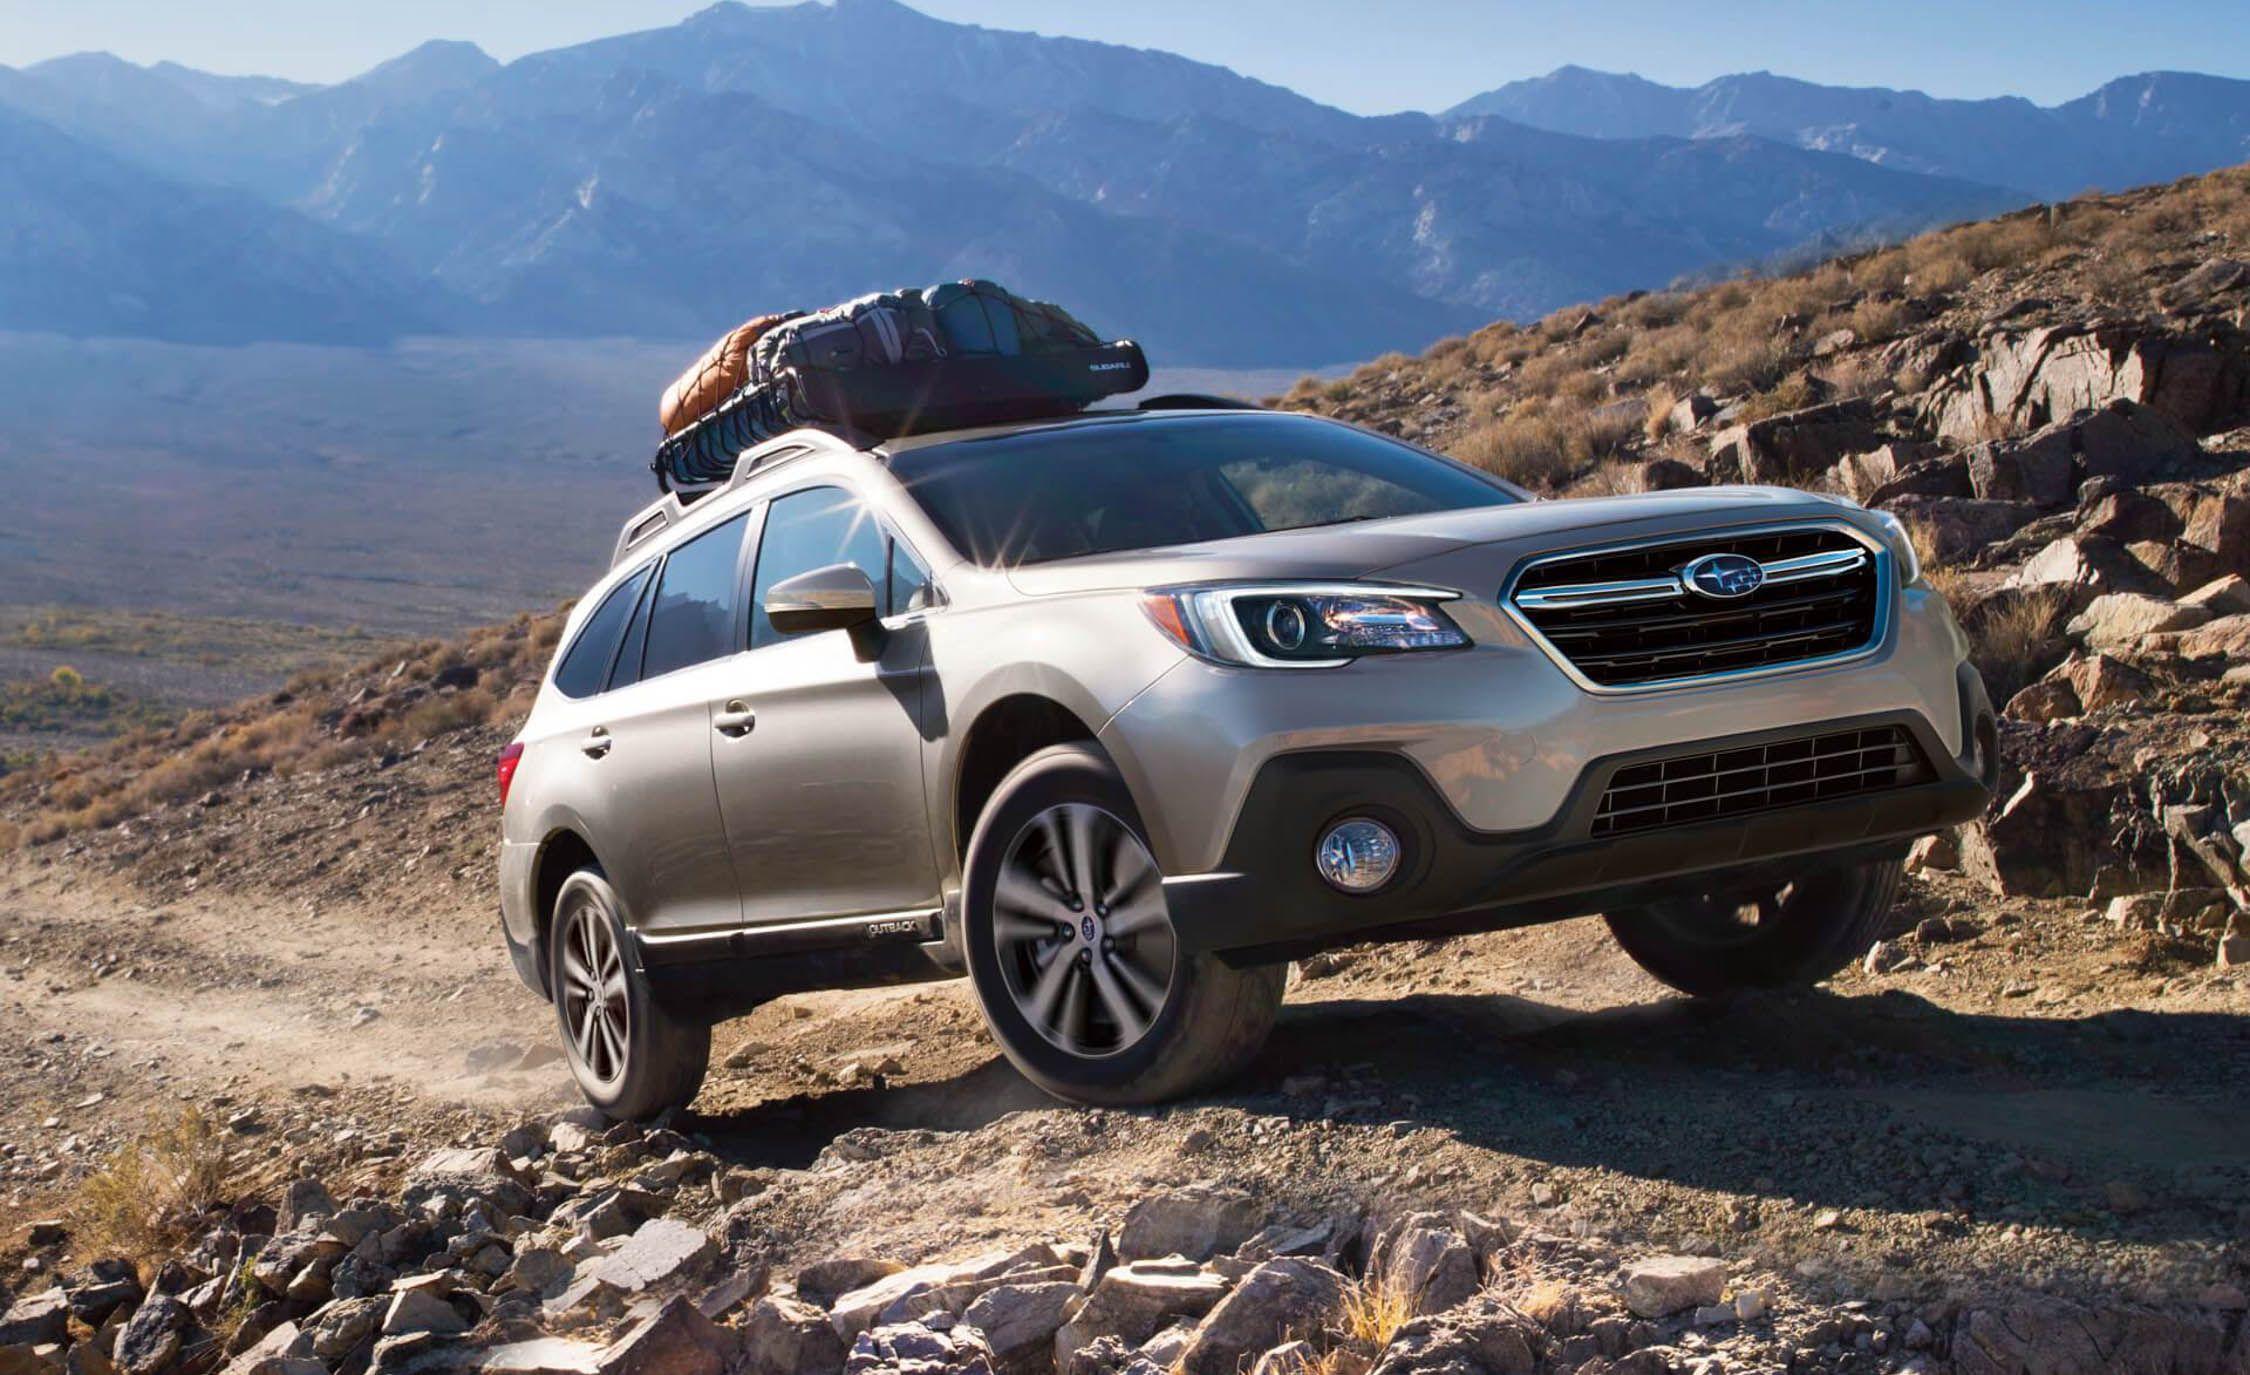 Subaru cooled seats